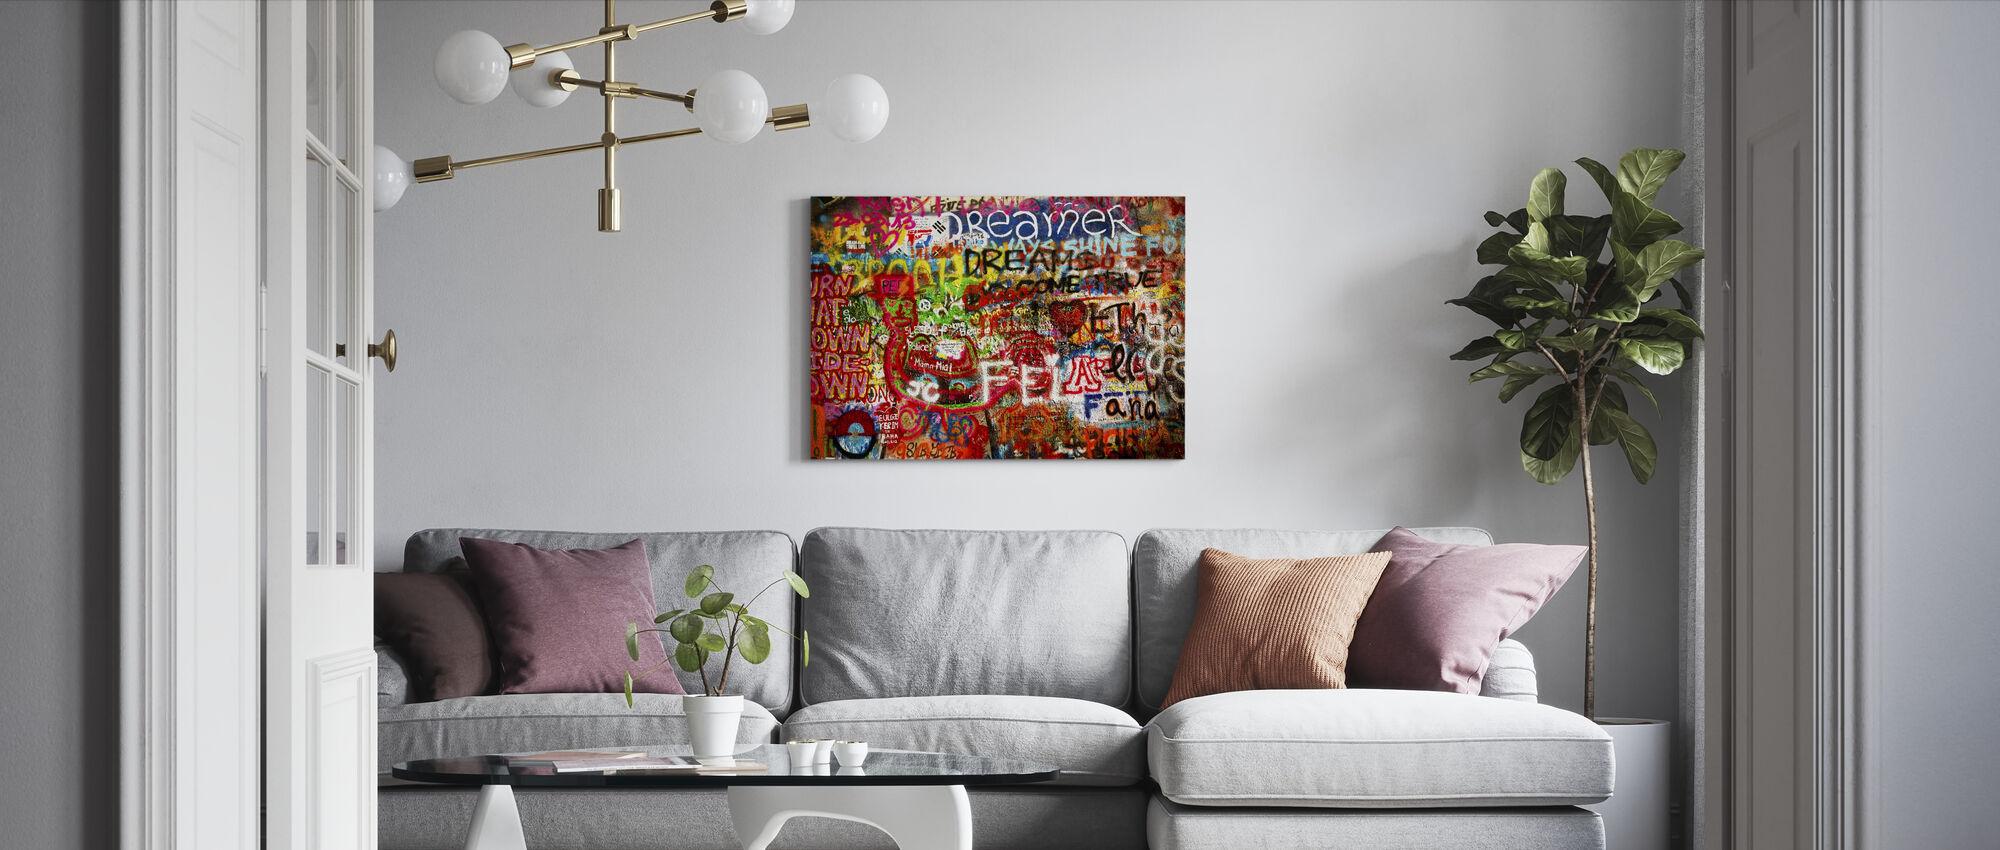 Graffiti-muur - Canvas print - Woonkamer